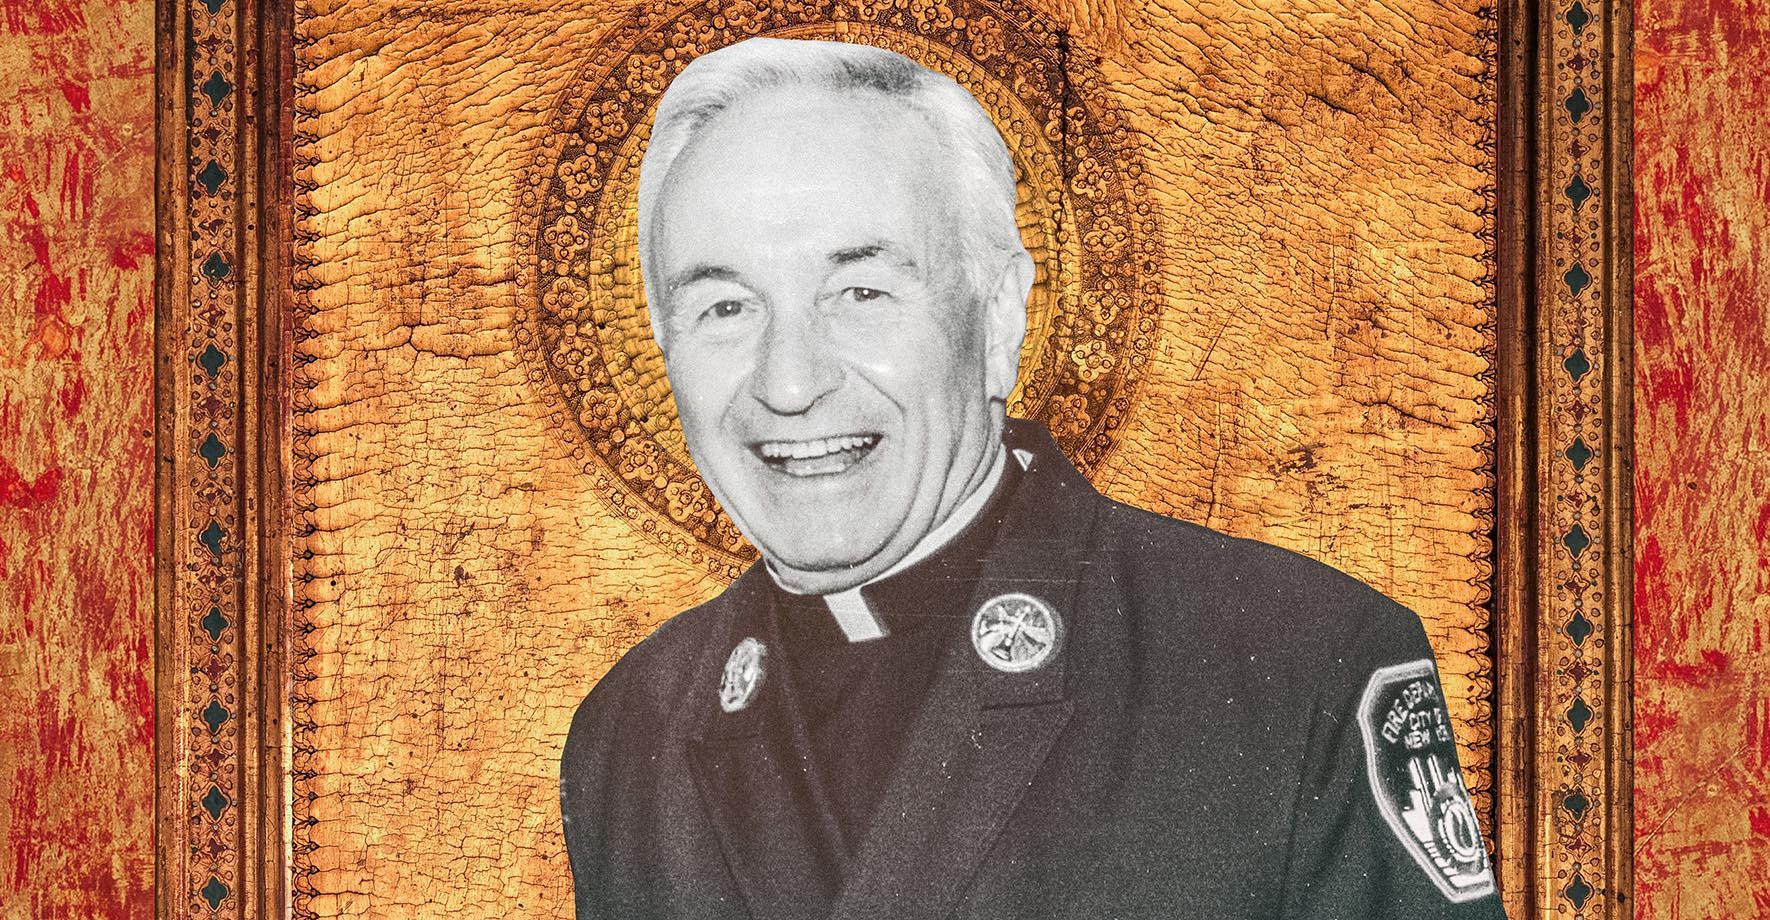 Rev. Mychal Judge, photographed July 28, 2001.